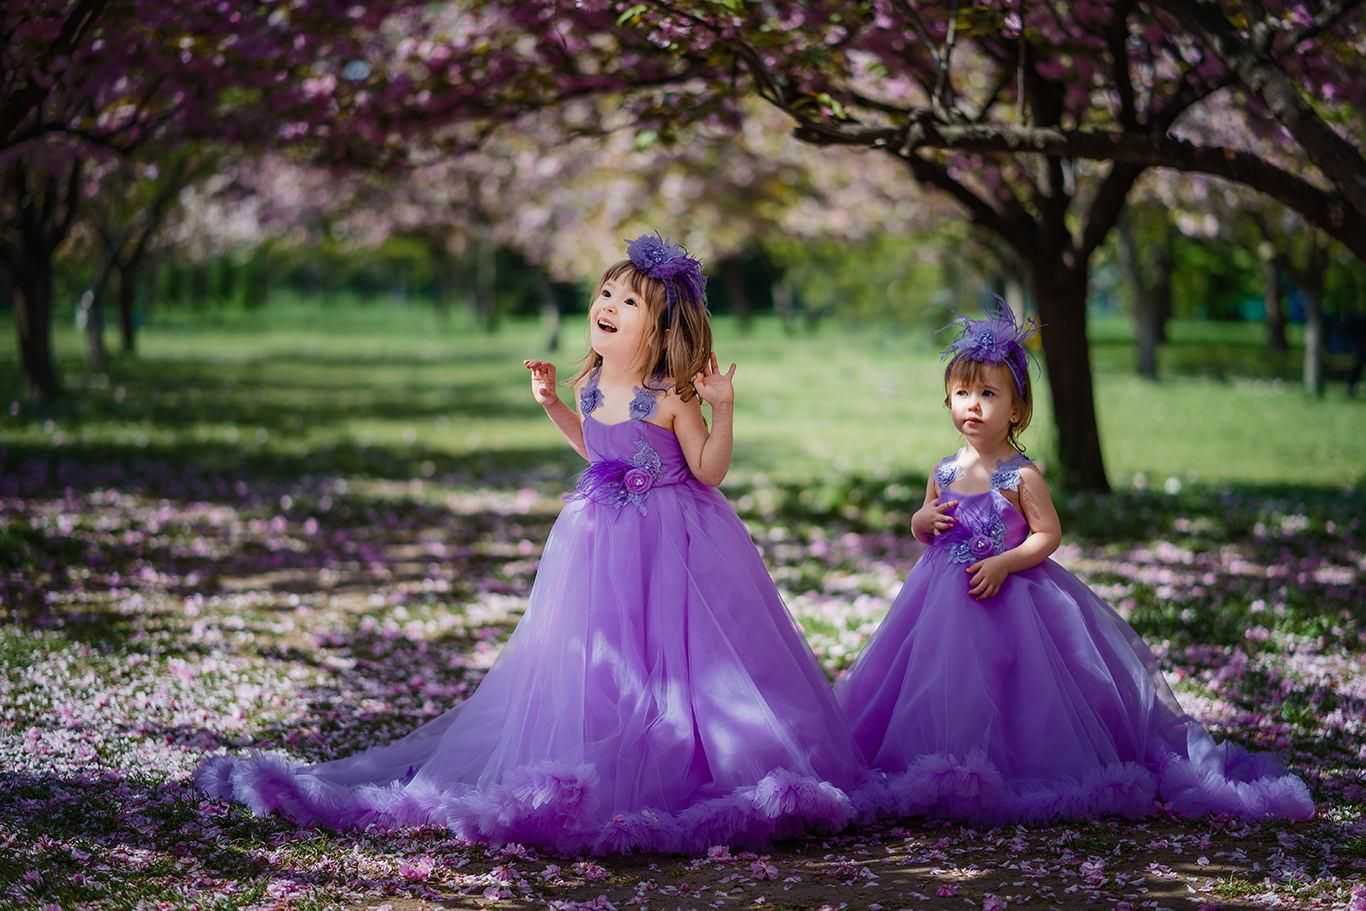 Bucuria copiilor in gradina inflorita